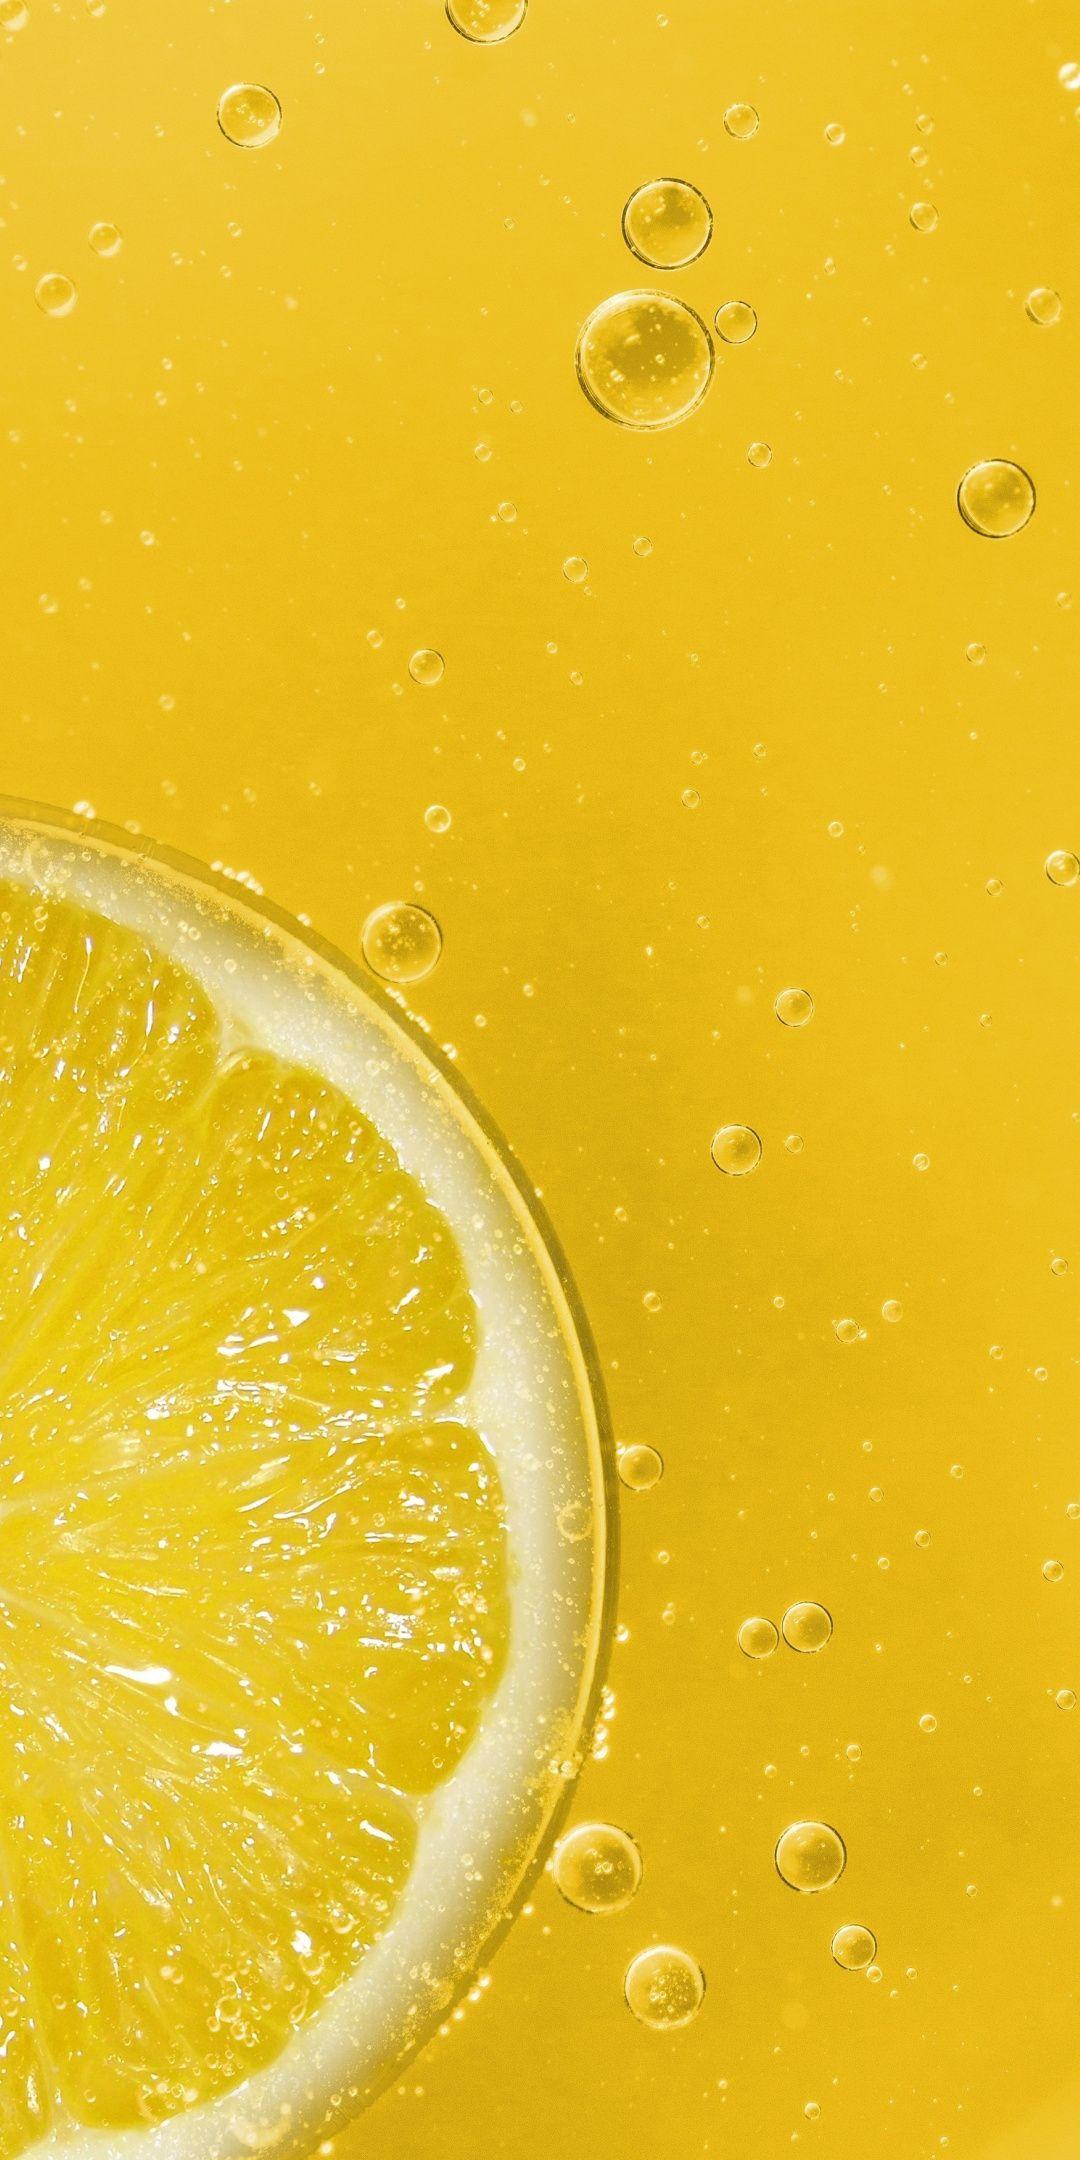 Pin By Mehrnoosh On Lemon Fruit Background Summer Drinks Alcohol Lime